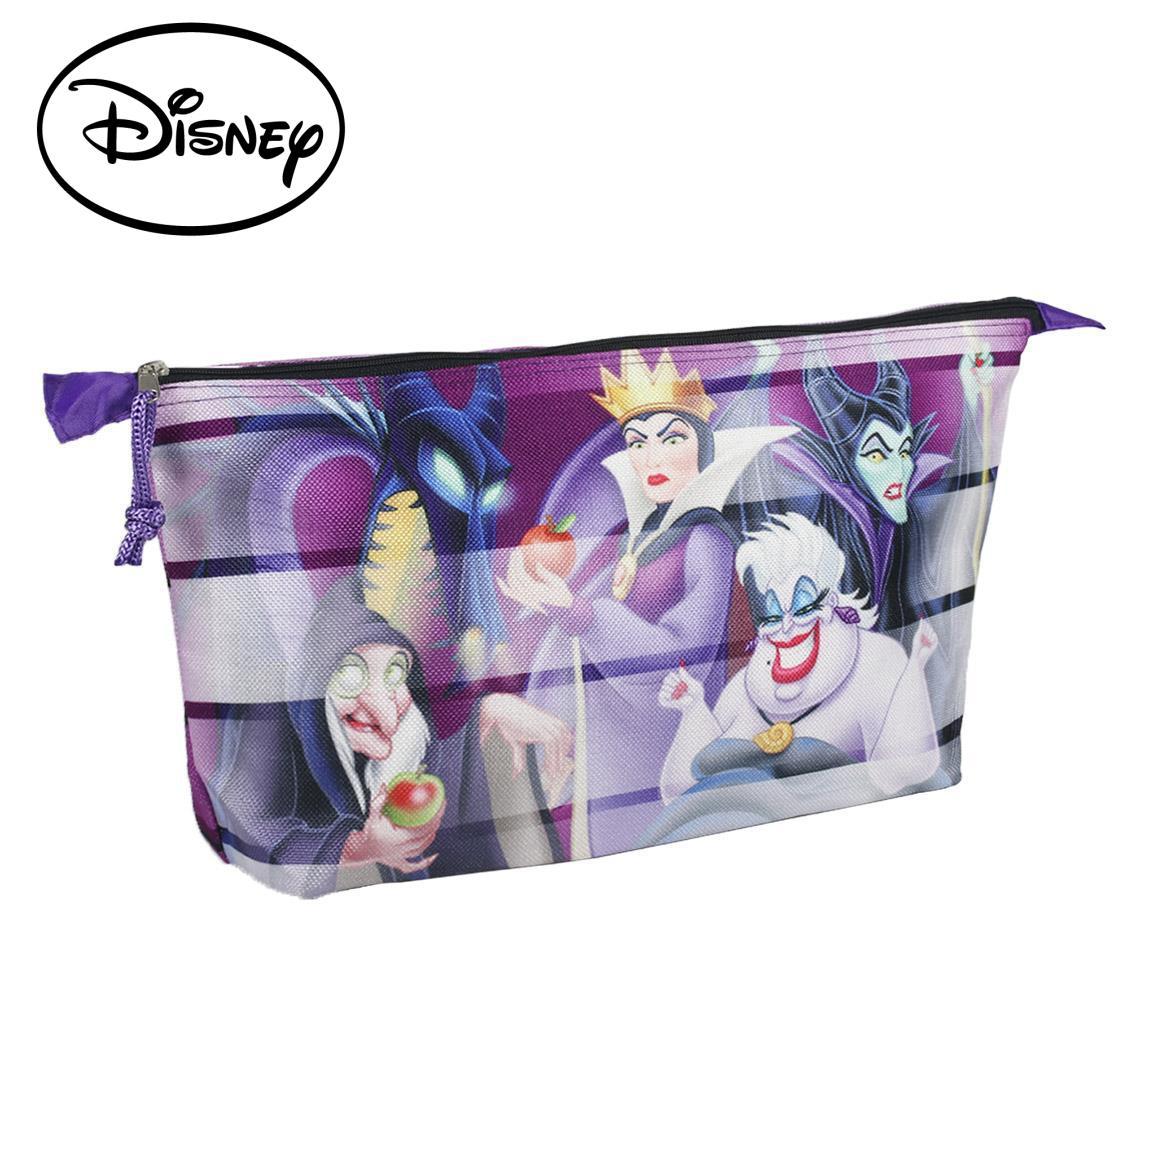 Cosmetic Bag Set Personal Care/travel Classic Disney Villanas